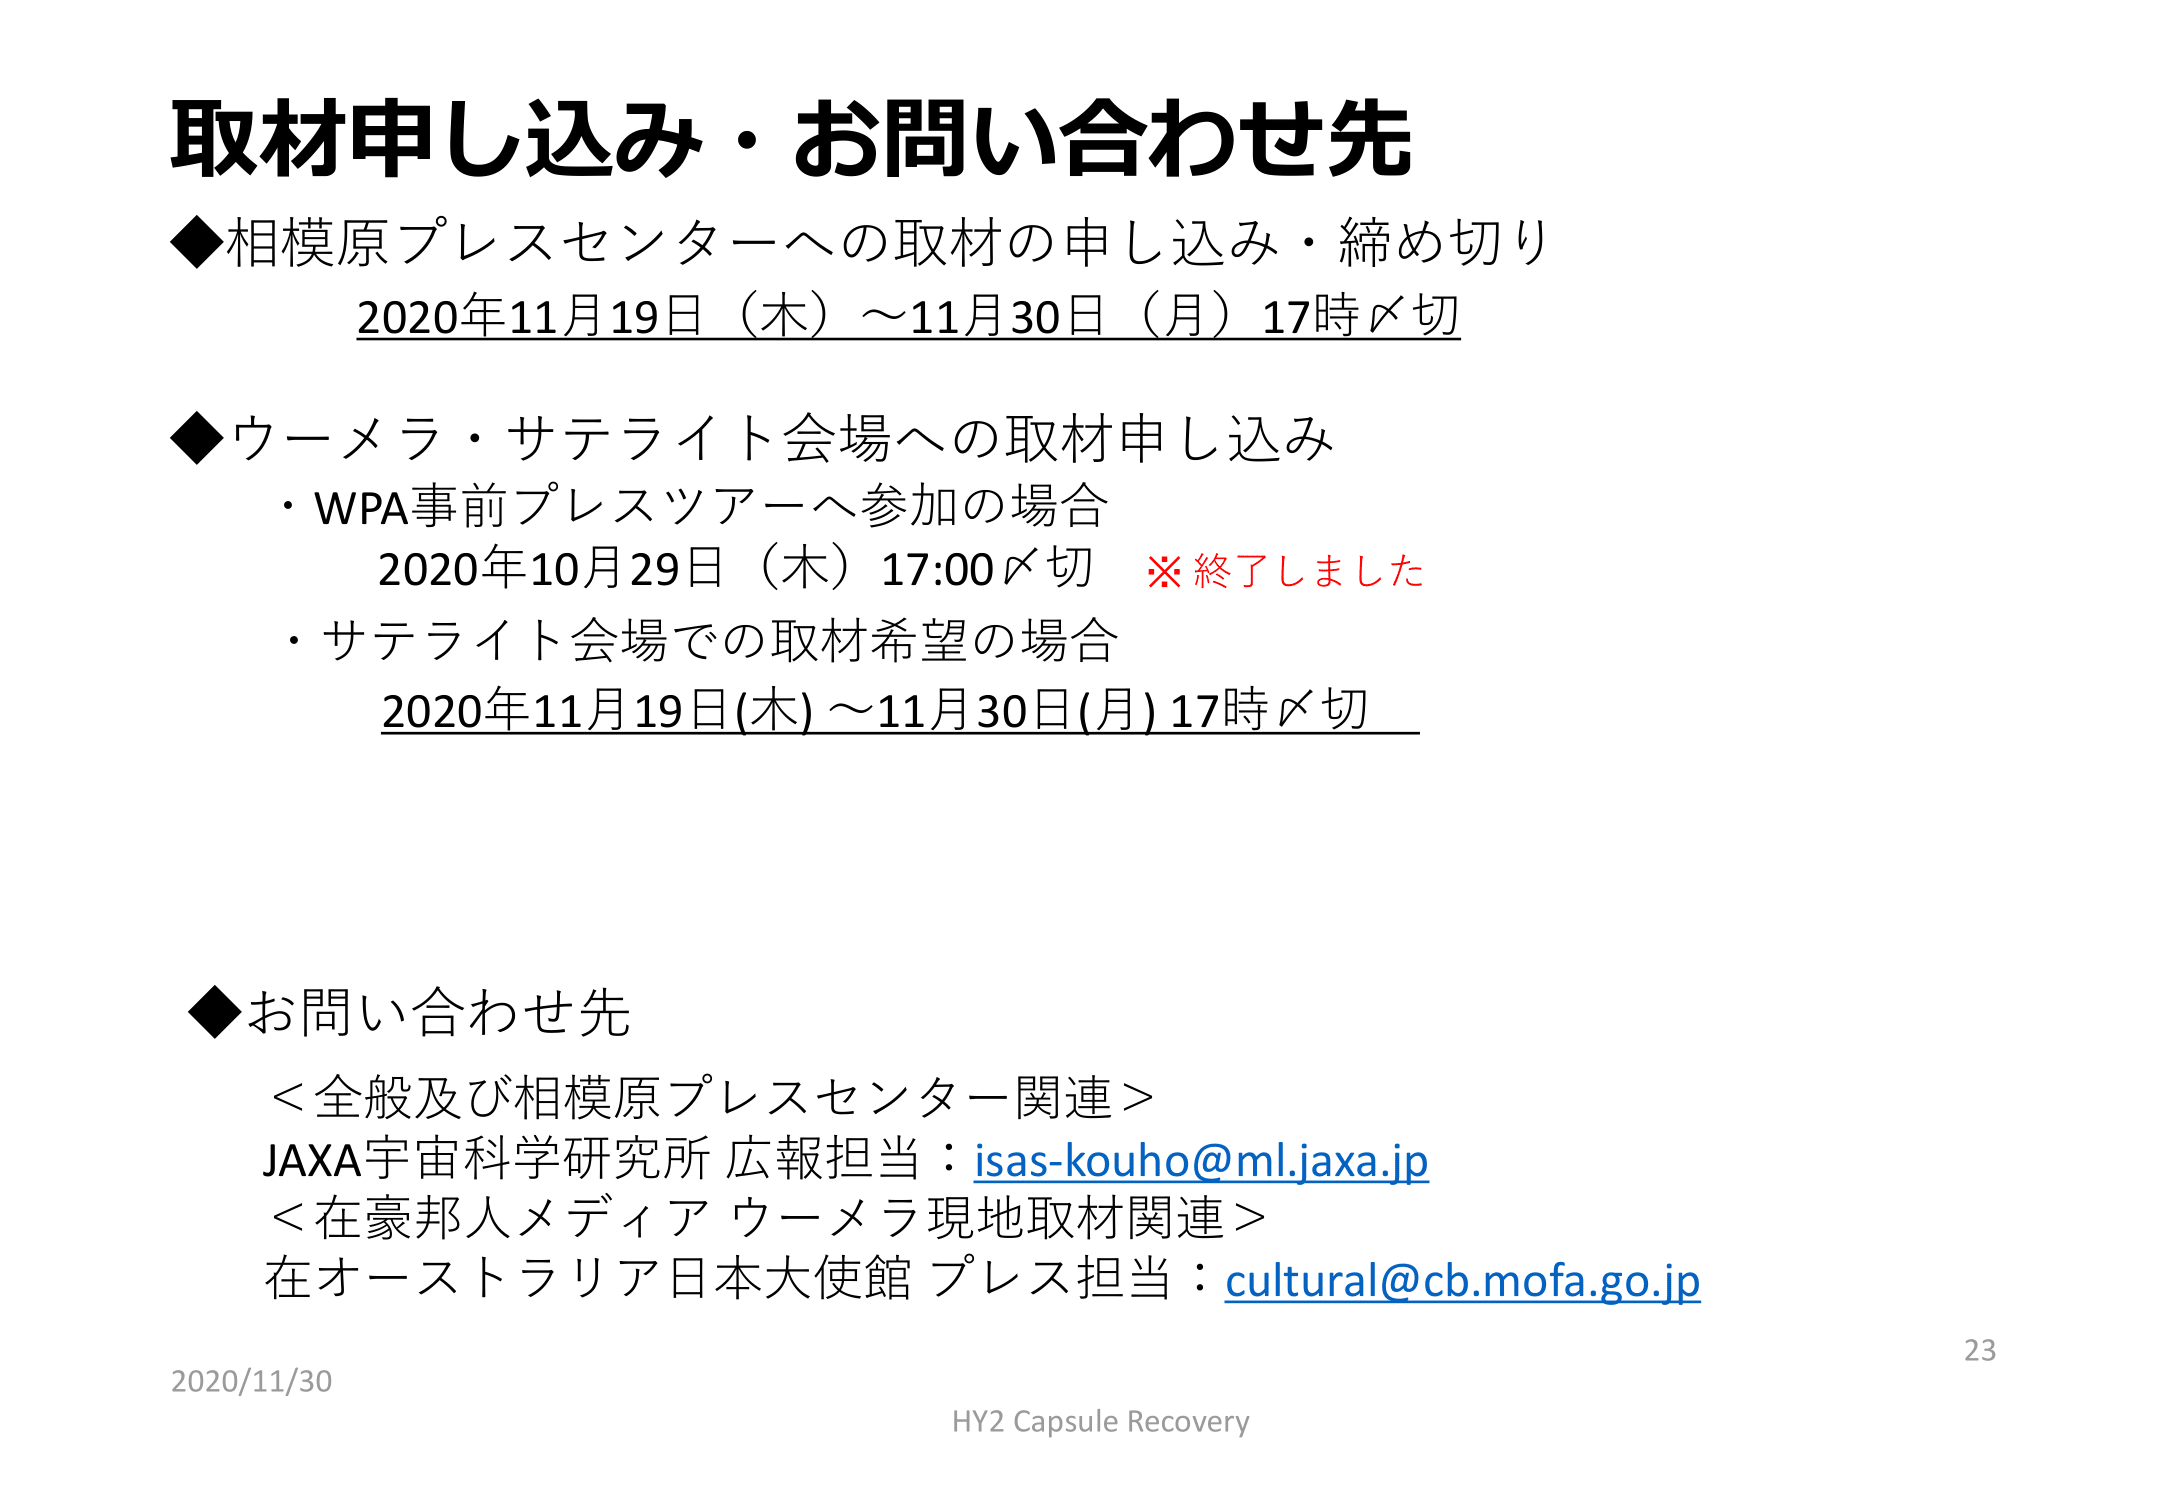 f:id:Imamura:20201130154554p:plain:h250